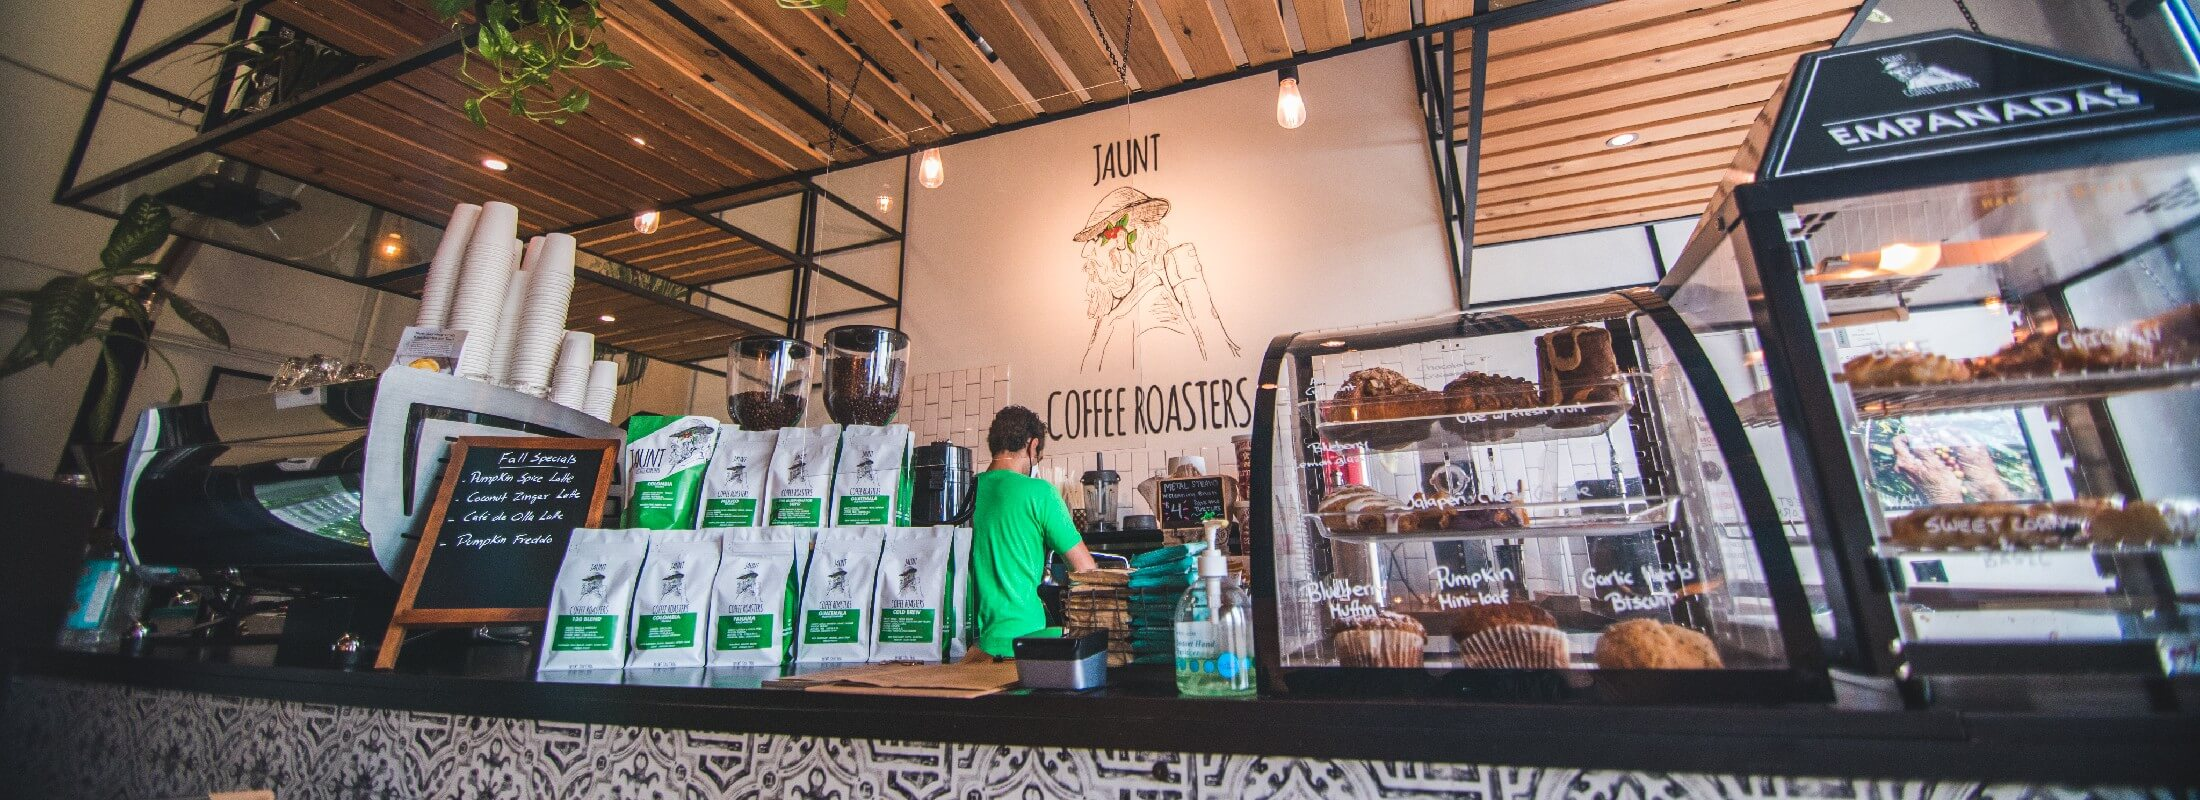 Specialty Coffee San Diego Jaunt Coffee Roasters